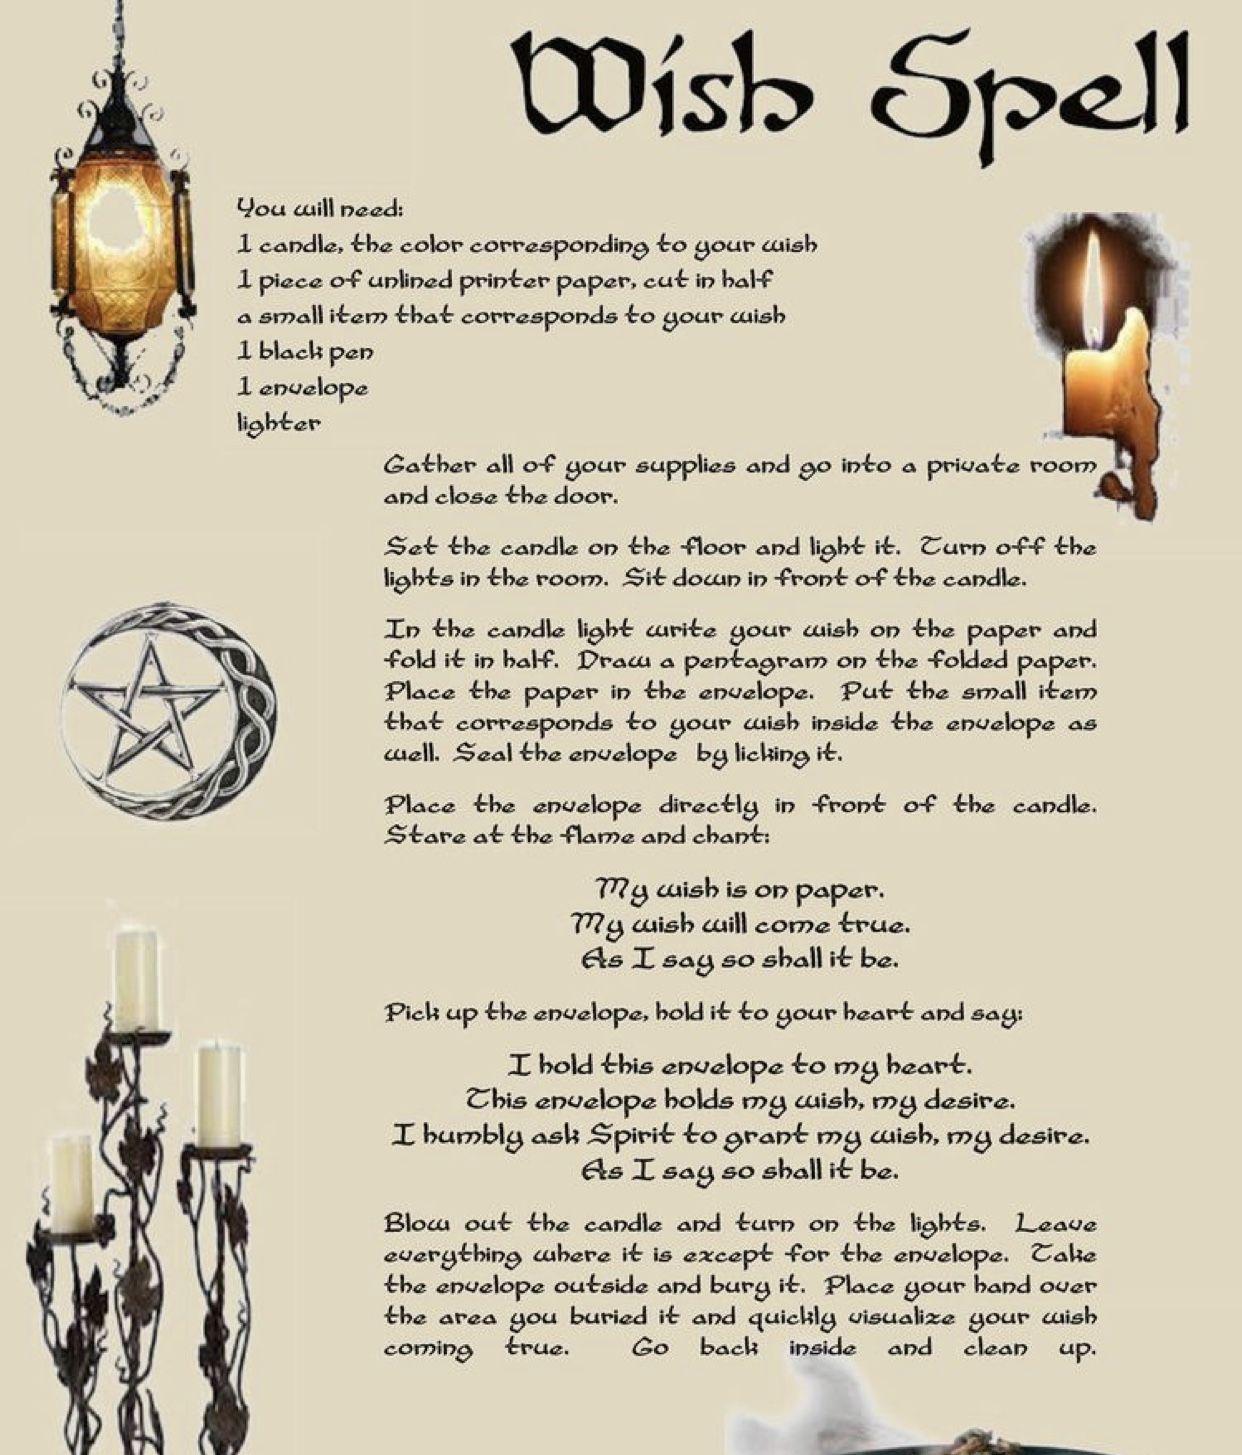 White Spells | Witchcraft | Spells | Magic | Wish Spells